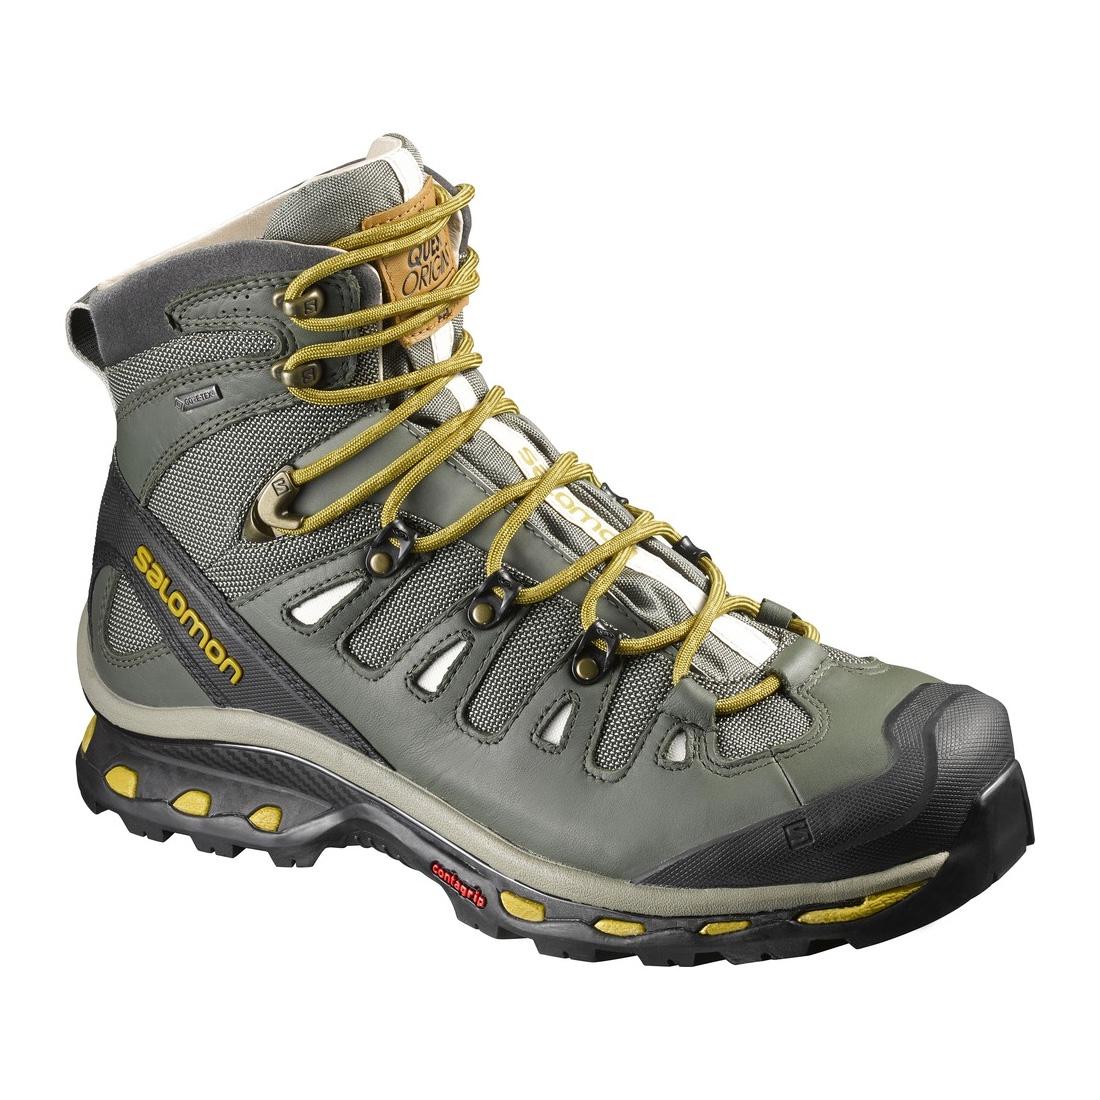 07fe35b57c4b Image of Salomon Quest Origins 2 GTX Walking Boots (Men s) - Tempest   Night